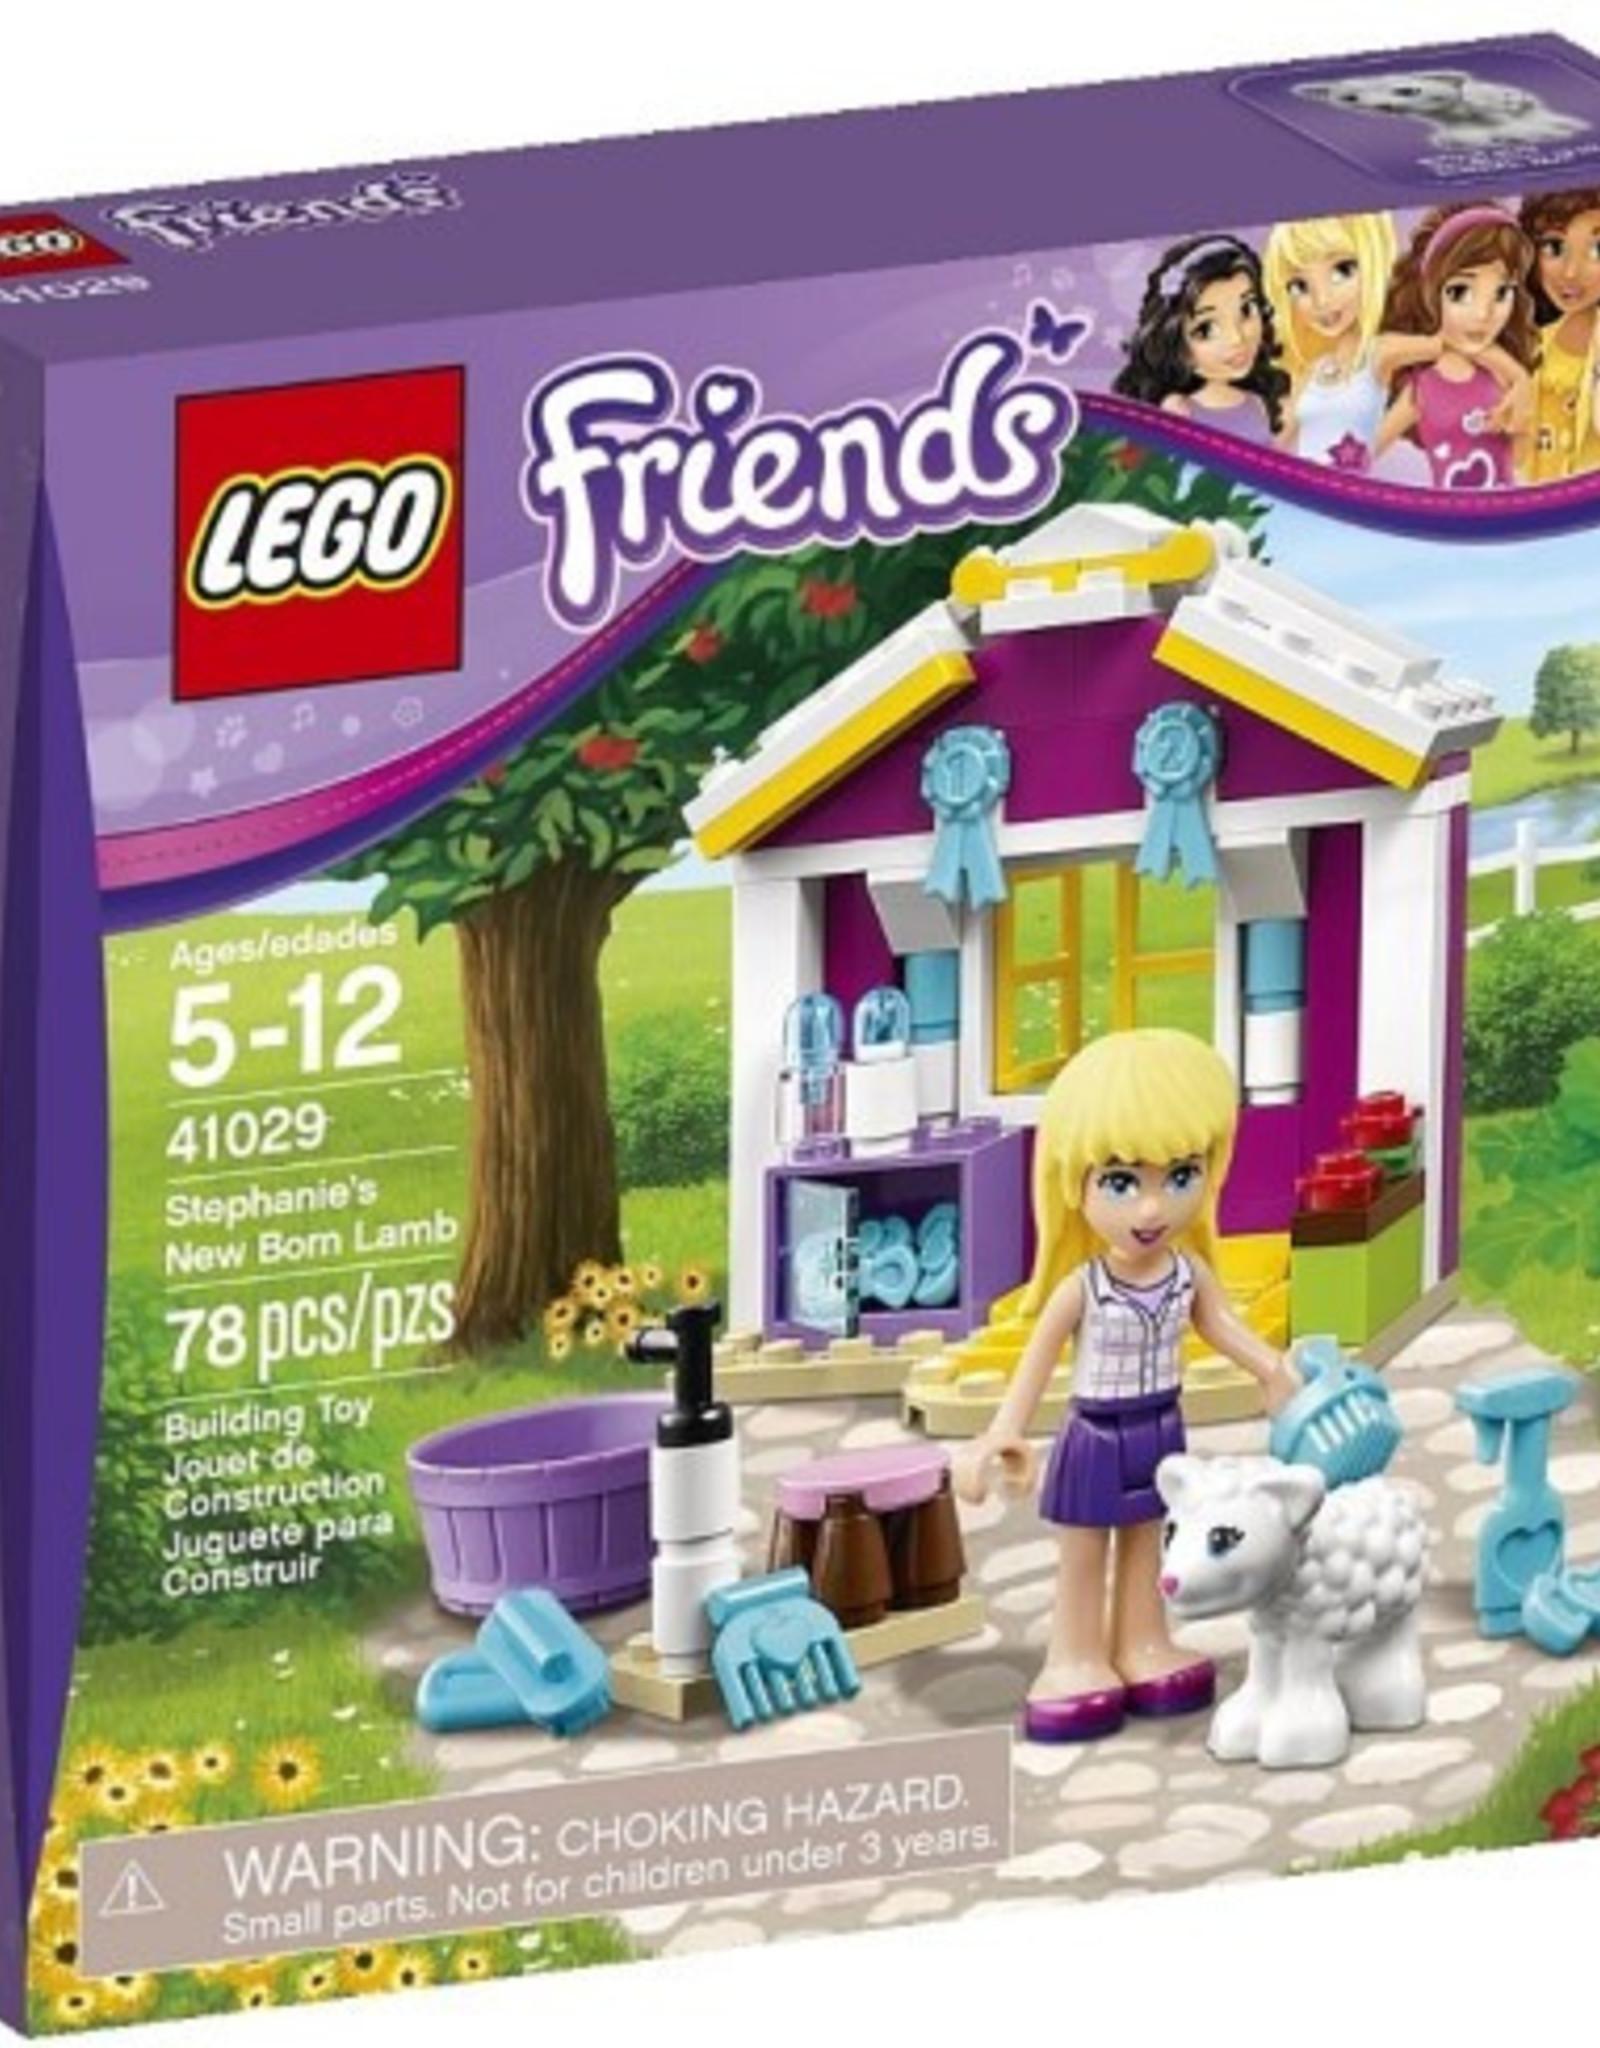 LEGO LEGO 41029 Stephanie's nieuw geboren lam FRIENDS